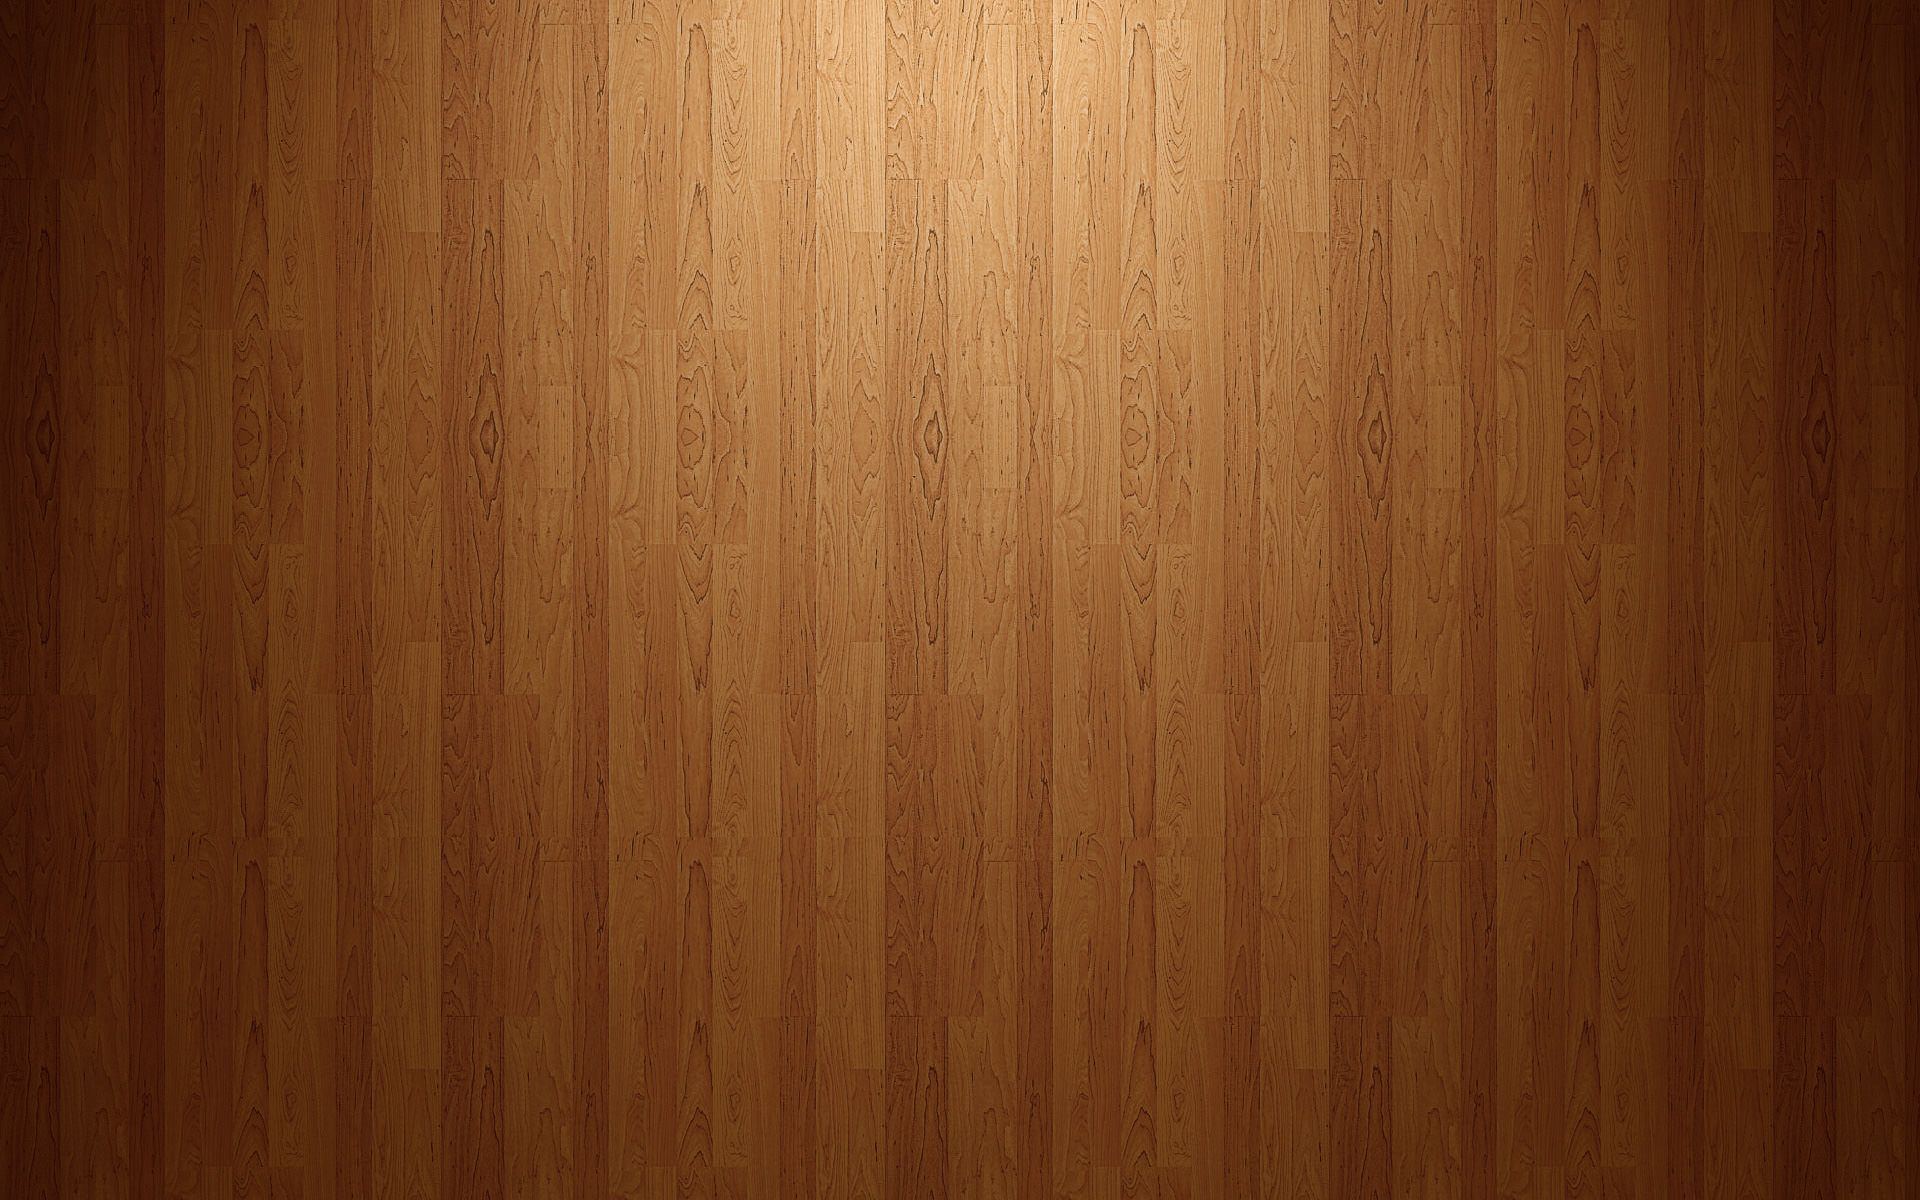 HD Wood Backgrounds Wallpaper HD Wallpapers Pinterest Wood